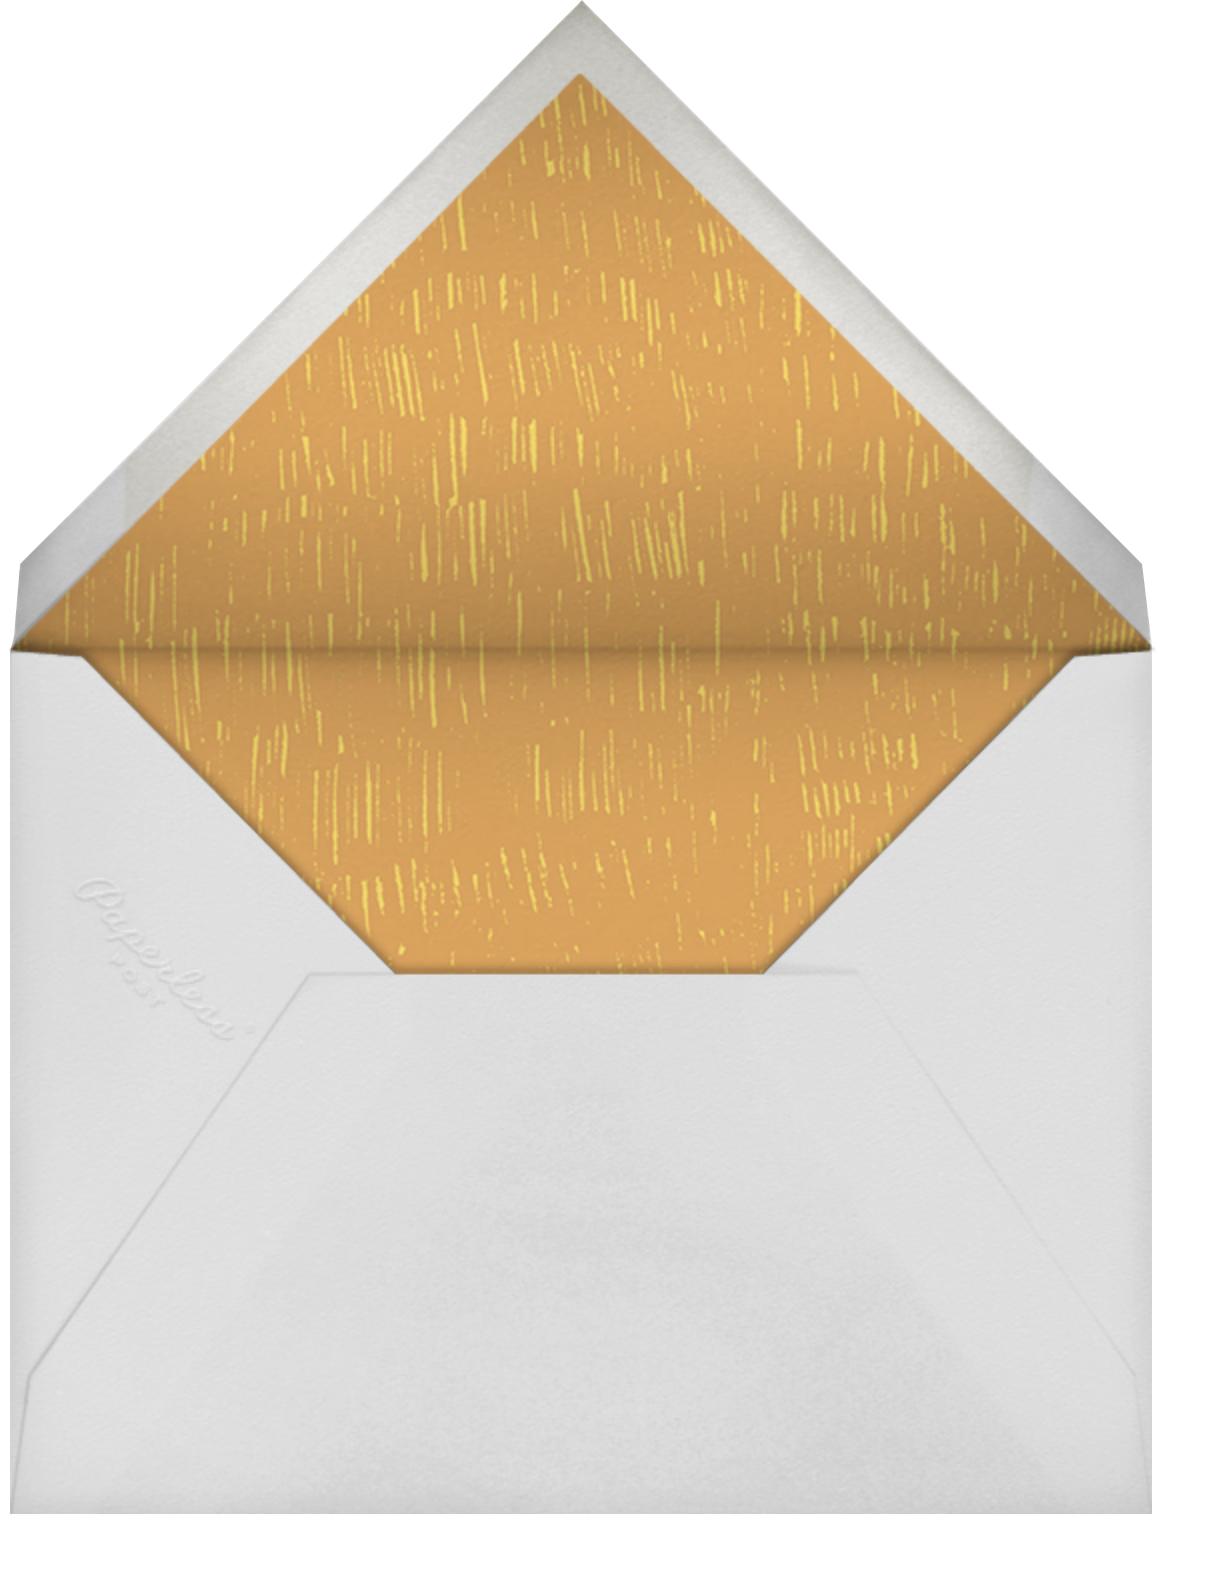 Pour Me A Cup - (Citrus And Mango) - Paperless Post - Bridal shower - envelope back